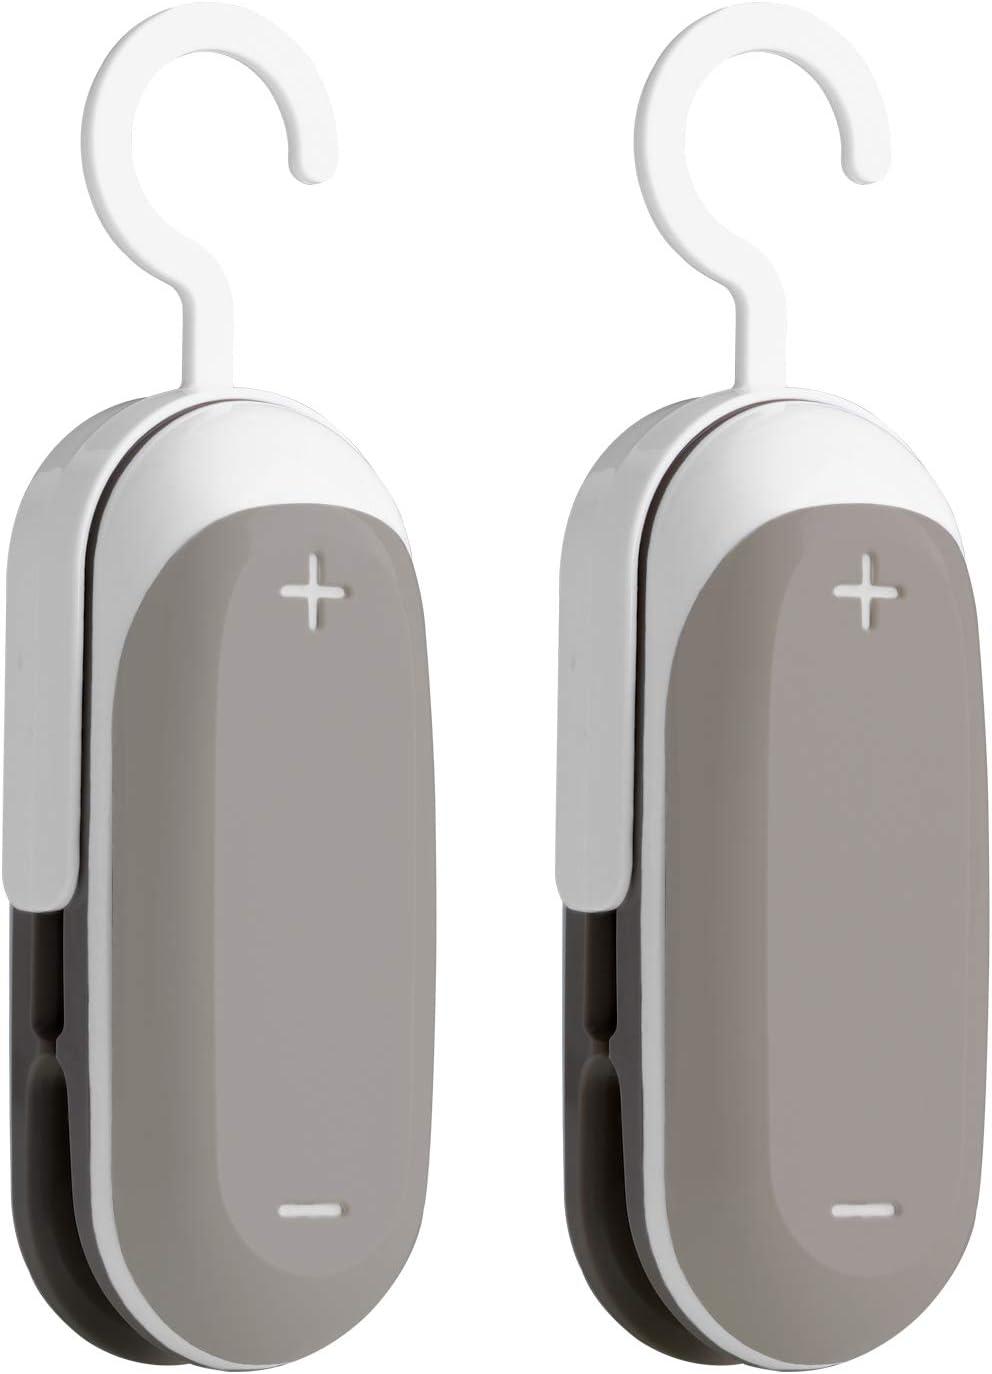 Aotesbu Mini Bag Sealer, 2PACK Portable 2 in 1 Heat Vacuum Sealers, Plastic Sealer, Cutter Handheld with Detachable Hook, Food Storage Snack Fresh For Plastic Bags Food Storage